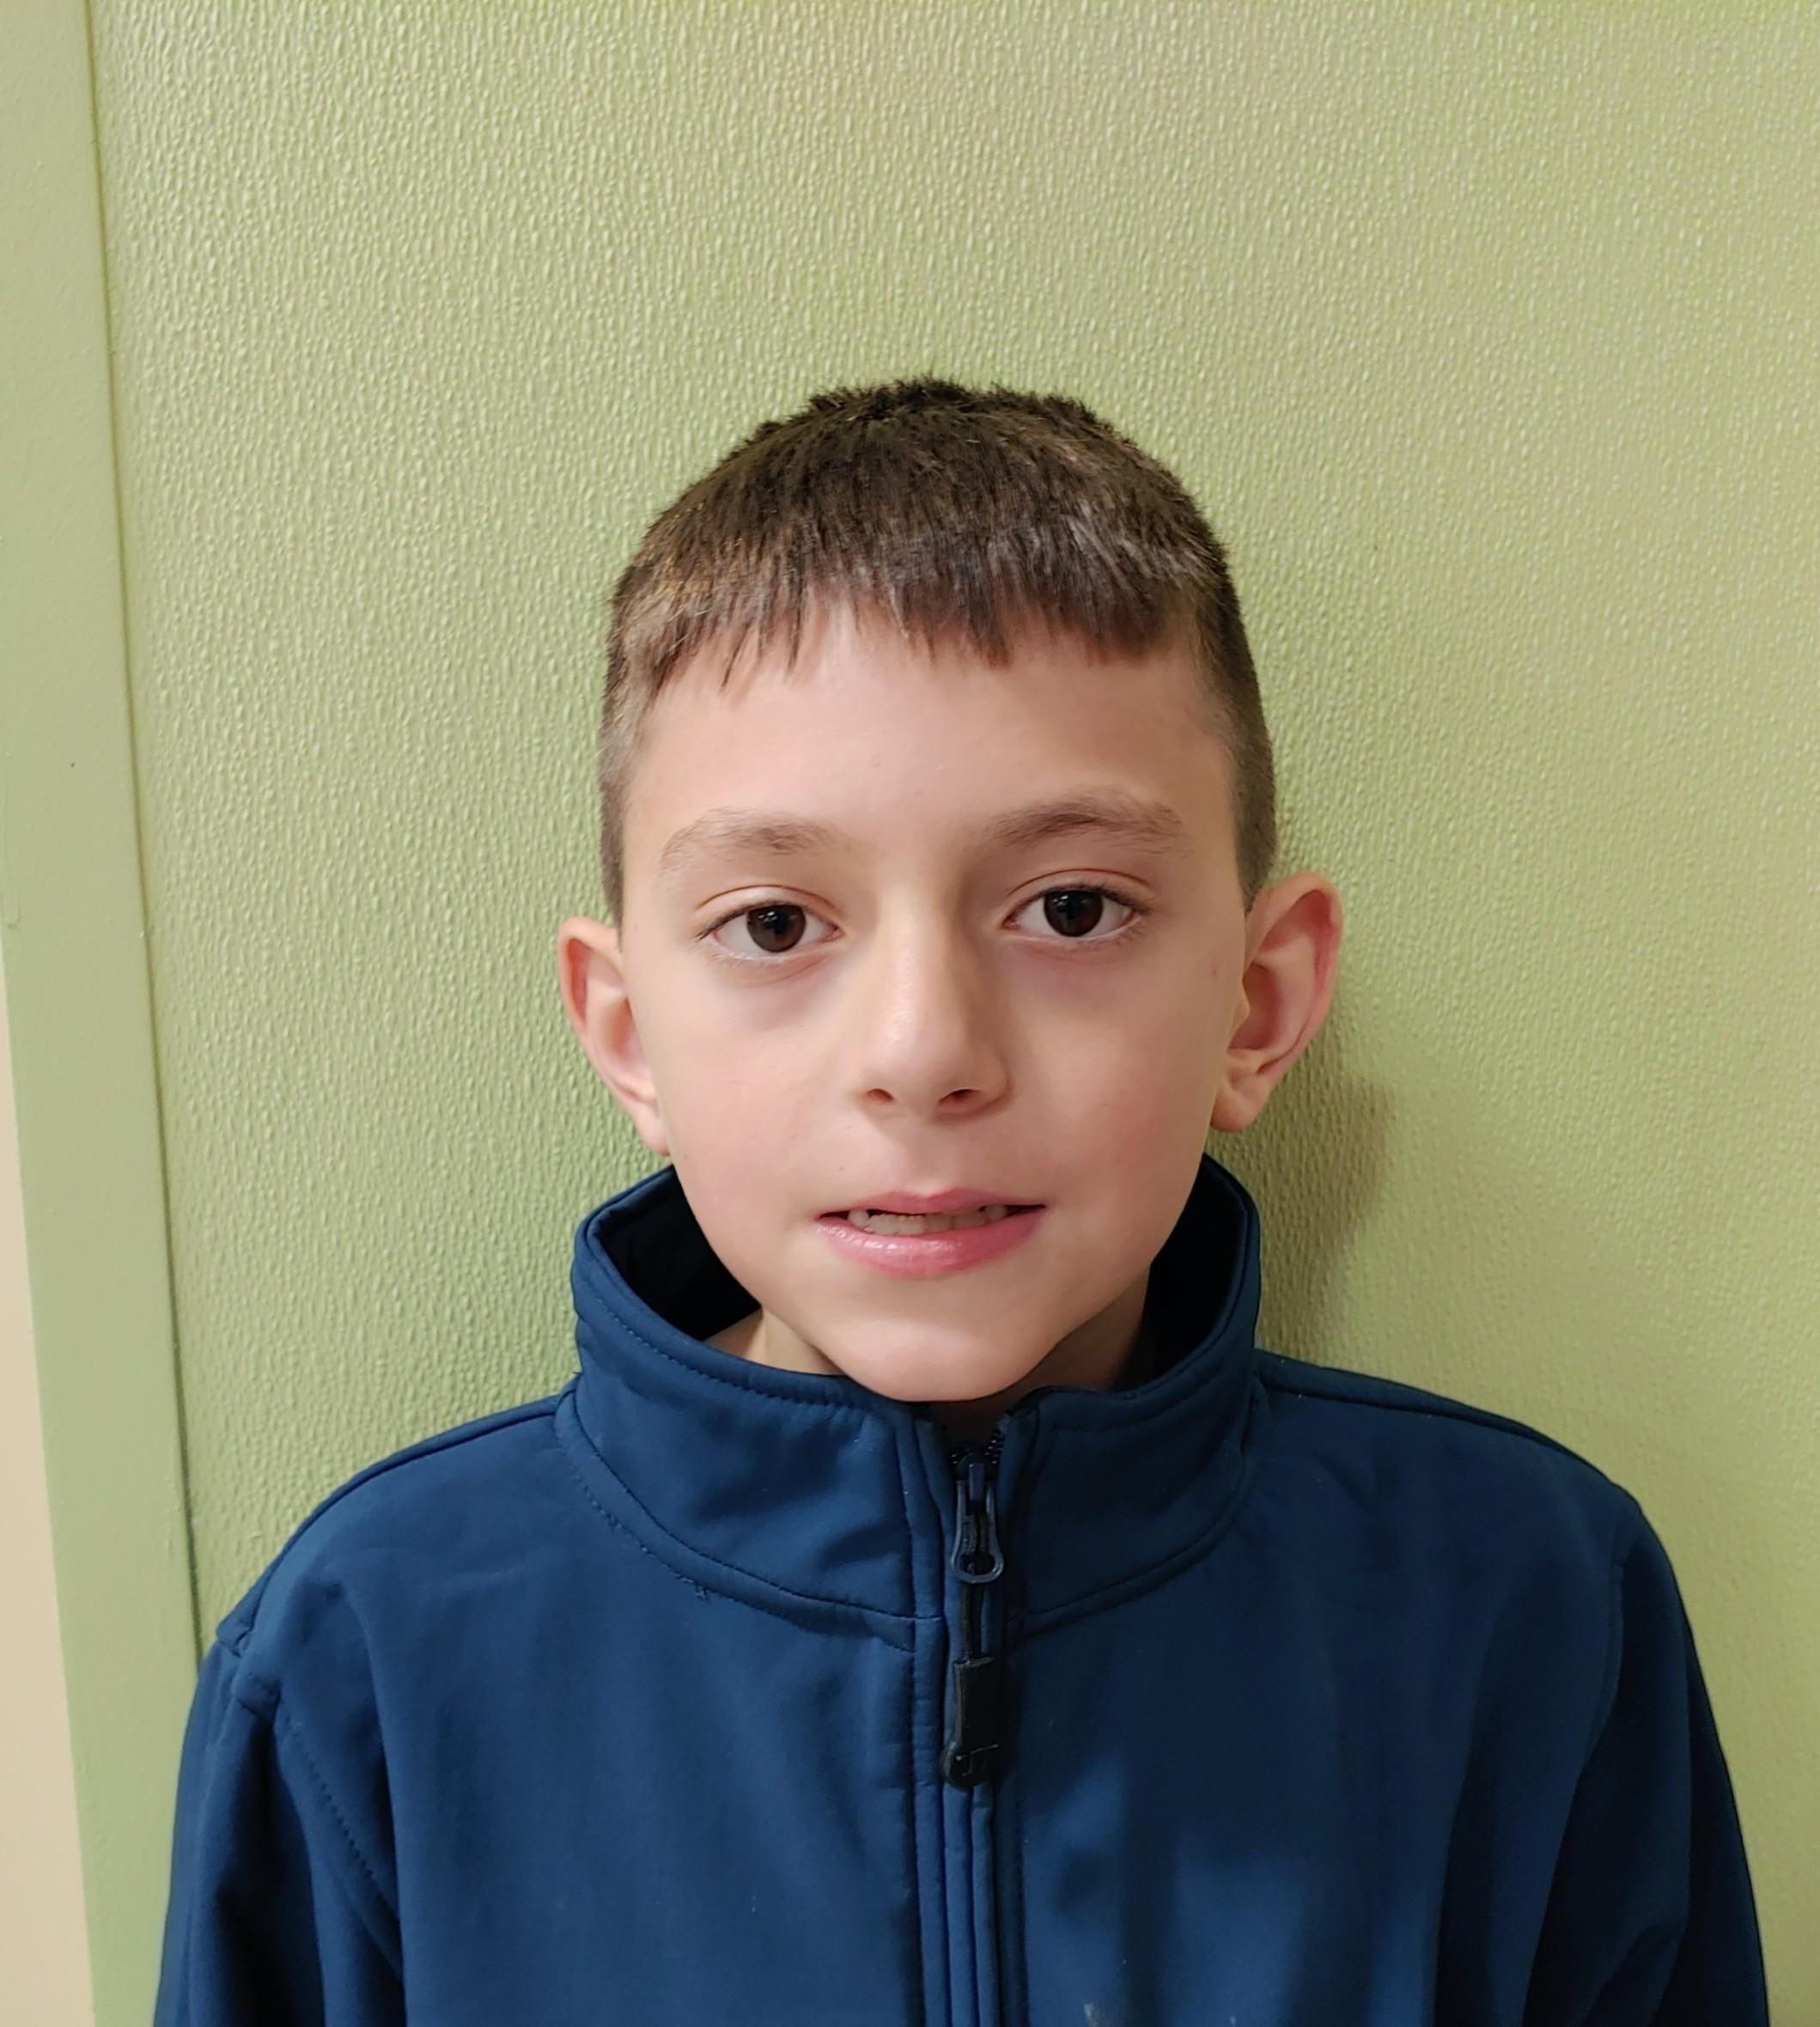 I play ice hockey, ride my bike, rollerblade, and play outside.  Jack, age 8  Daniel Island